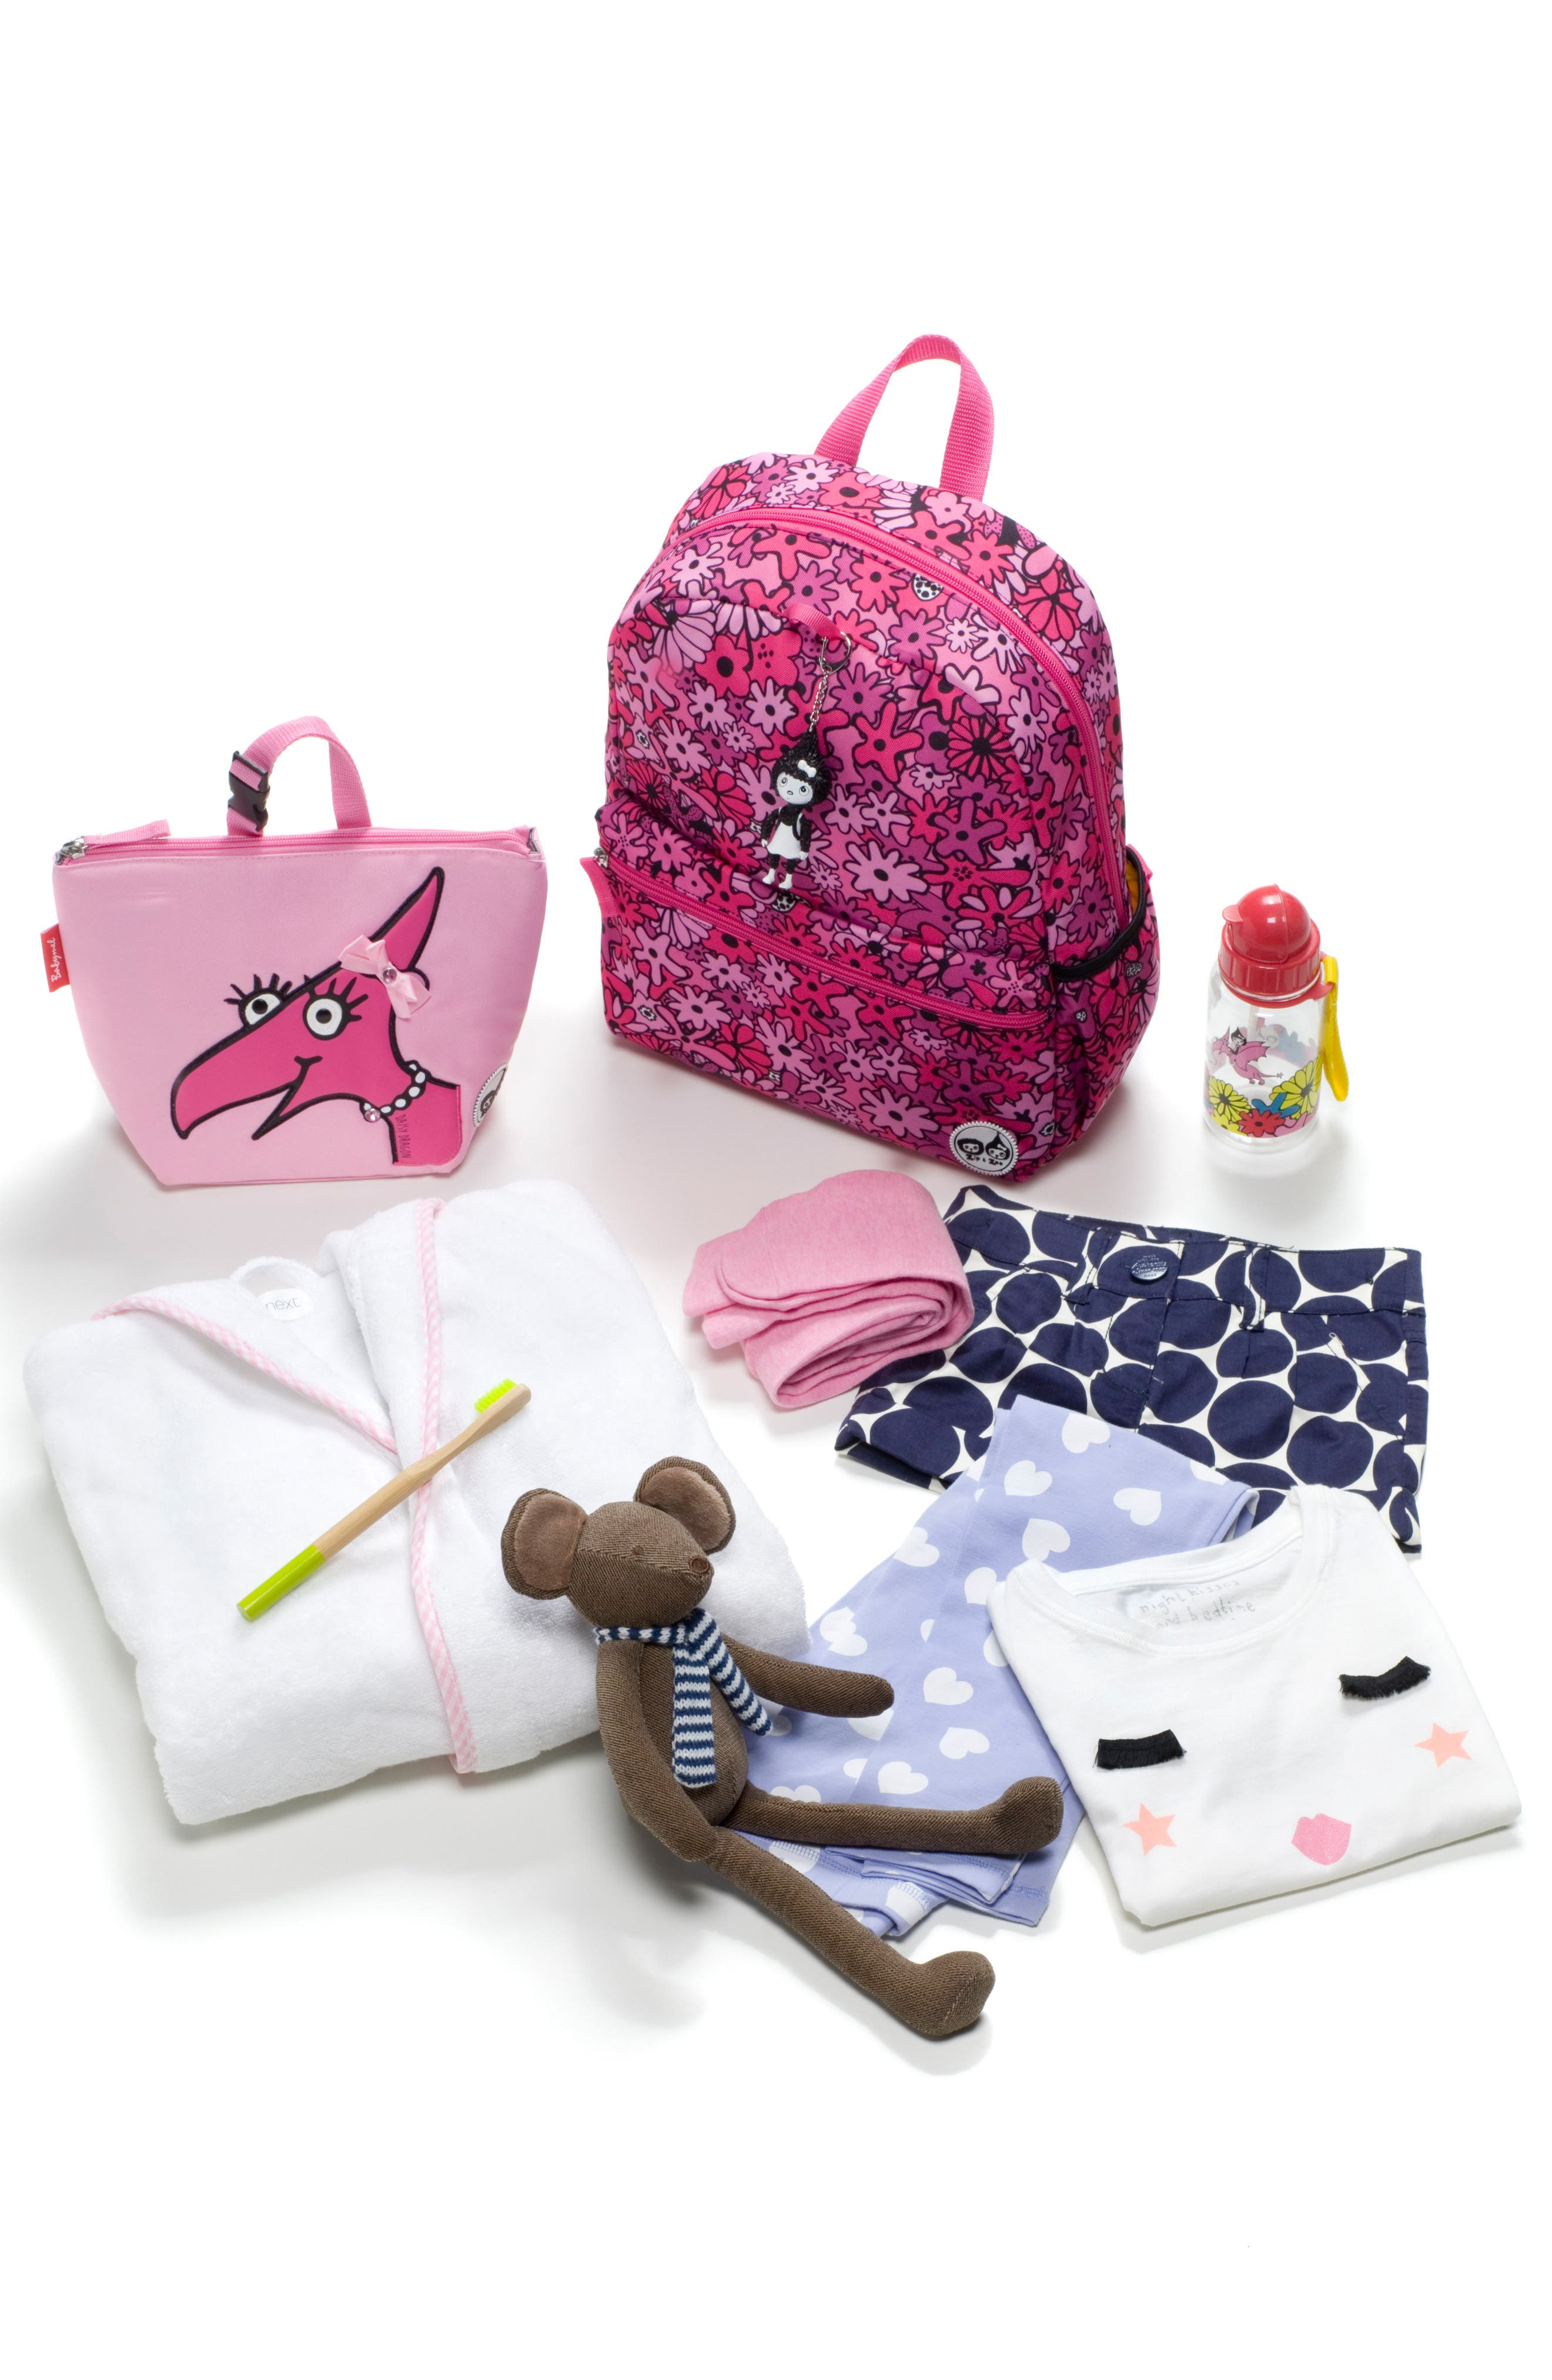 Zip & Zoe Floral Junior Backpack,                             Alternate thumbnail 9, color,                             FLORAL PINK